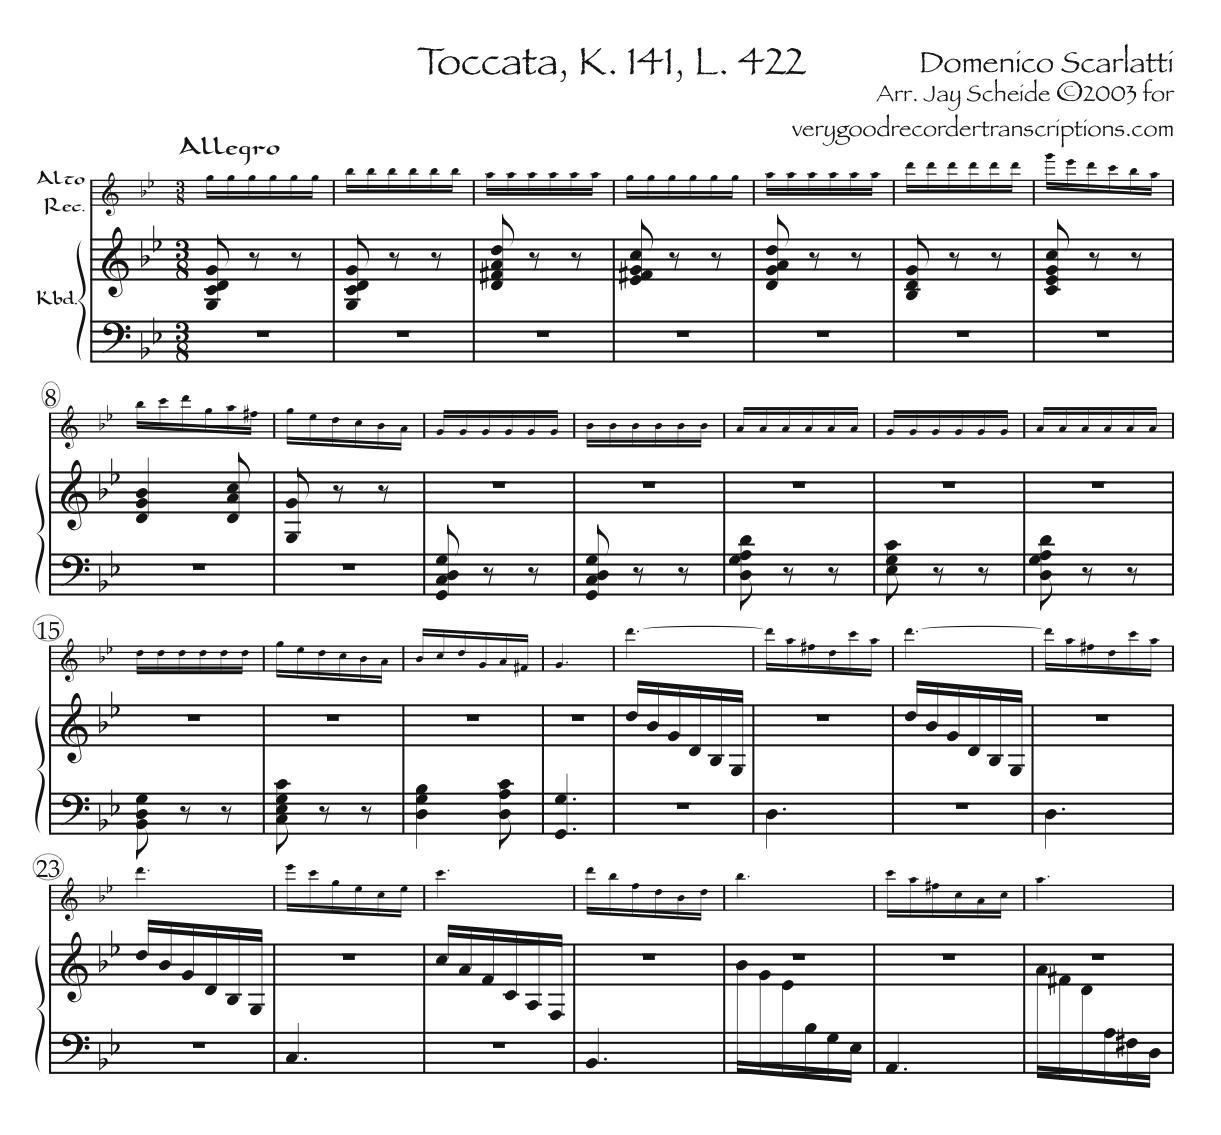 Toccata K. 141, L. 422, P. 271—really hard, medium hard, and easier versions